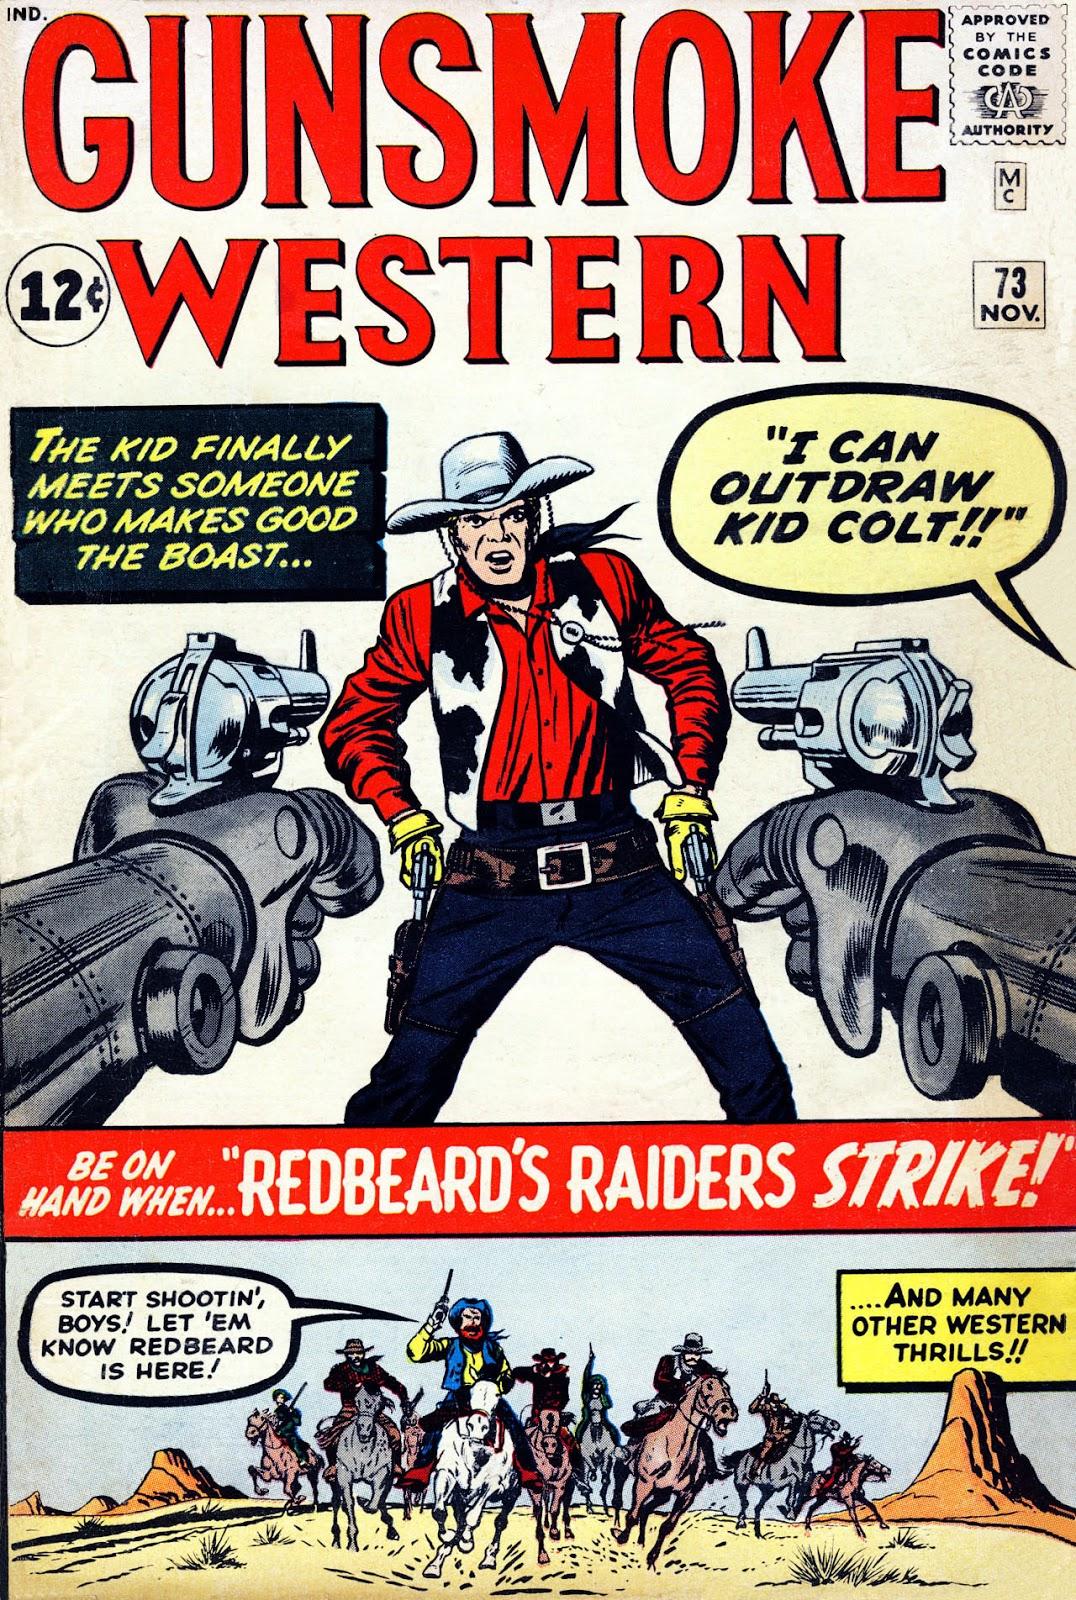 Gunsmoke Western issue 73 - Page 1